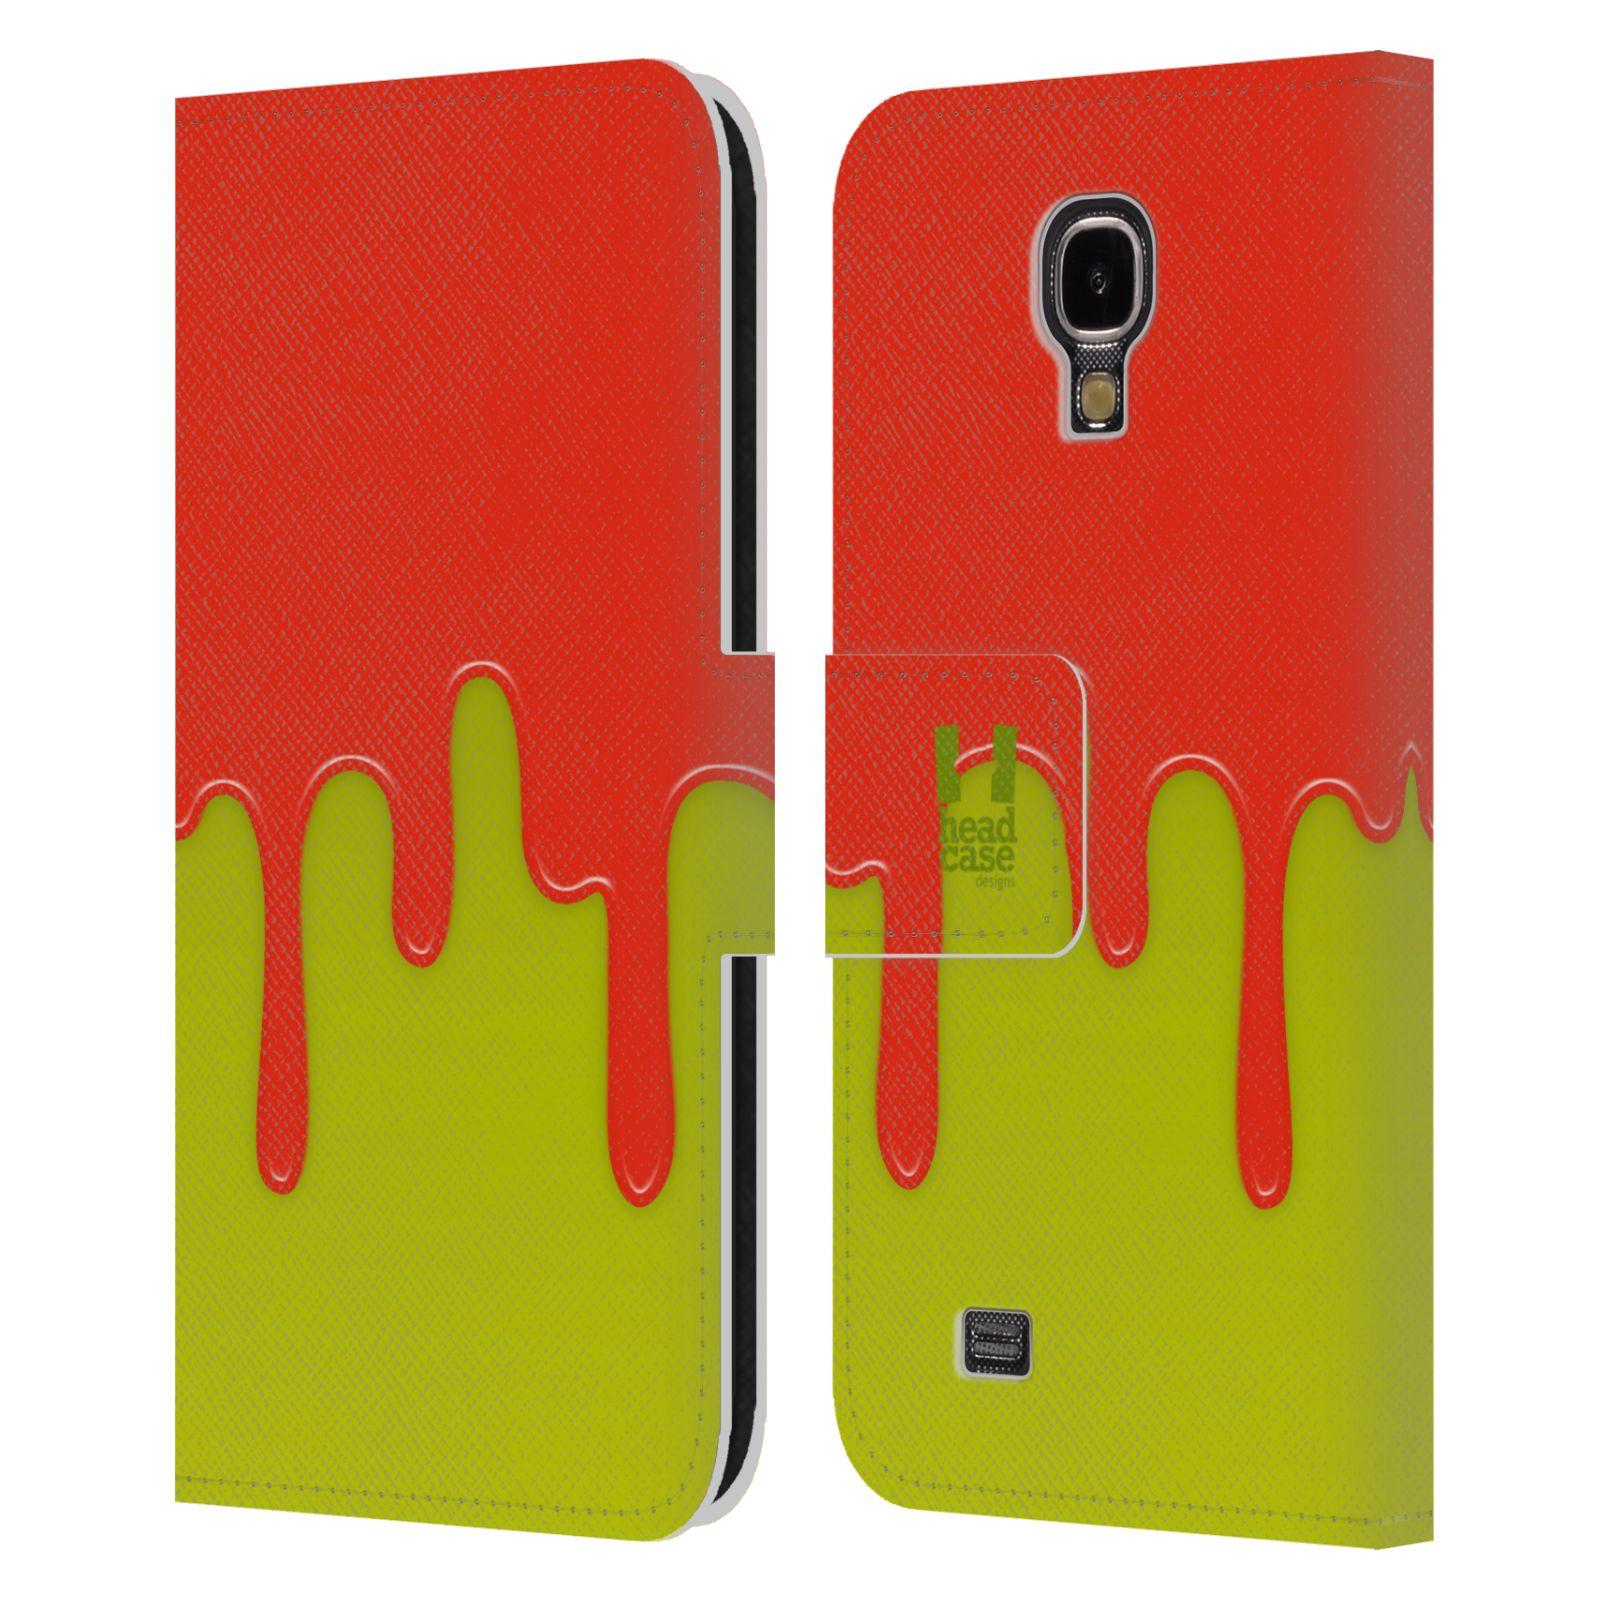 HEAD CASE Flipové pouzdro pro mobil Samsung Galaxy S4 Rozlitá barva oranžová a zelená